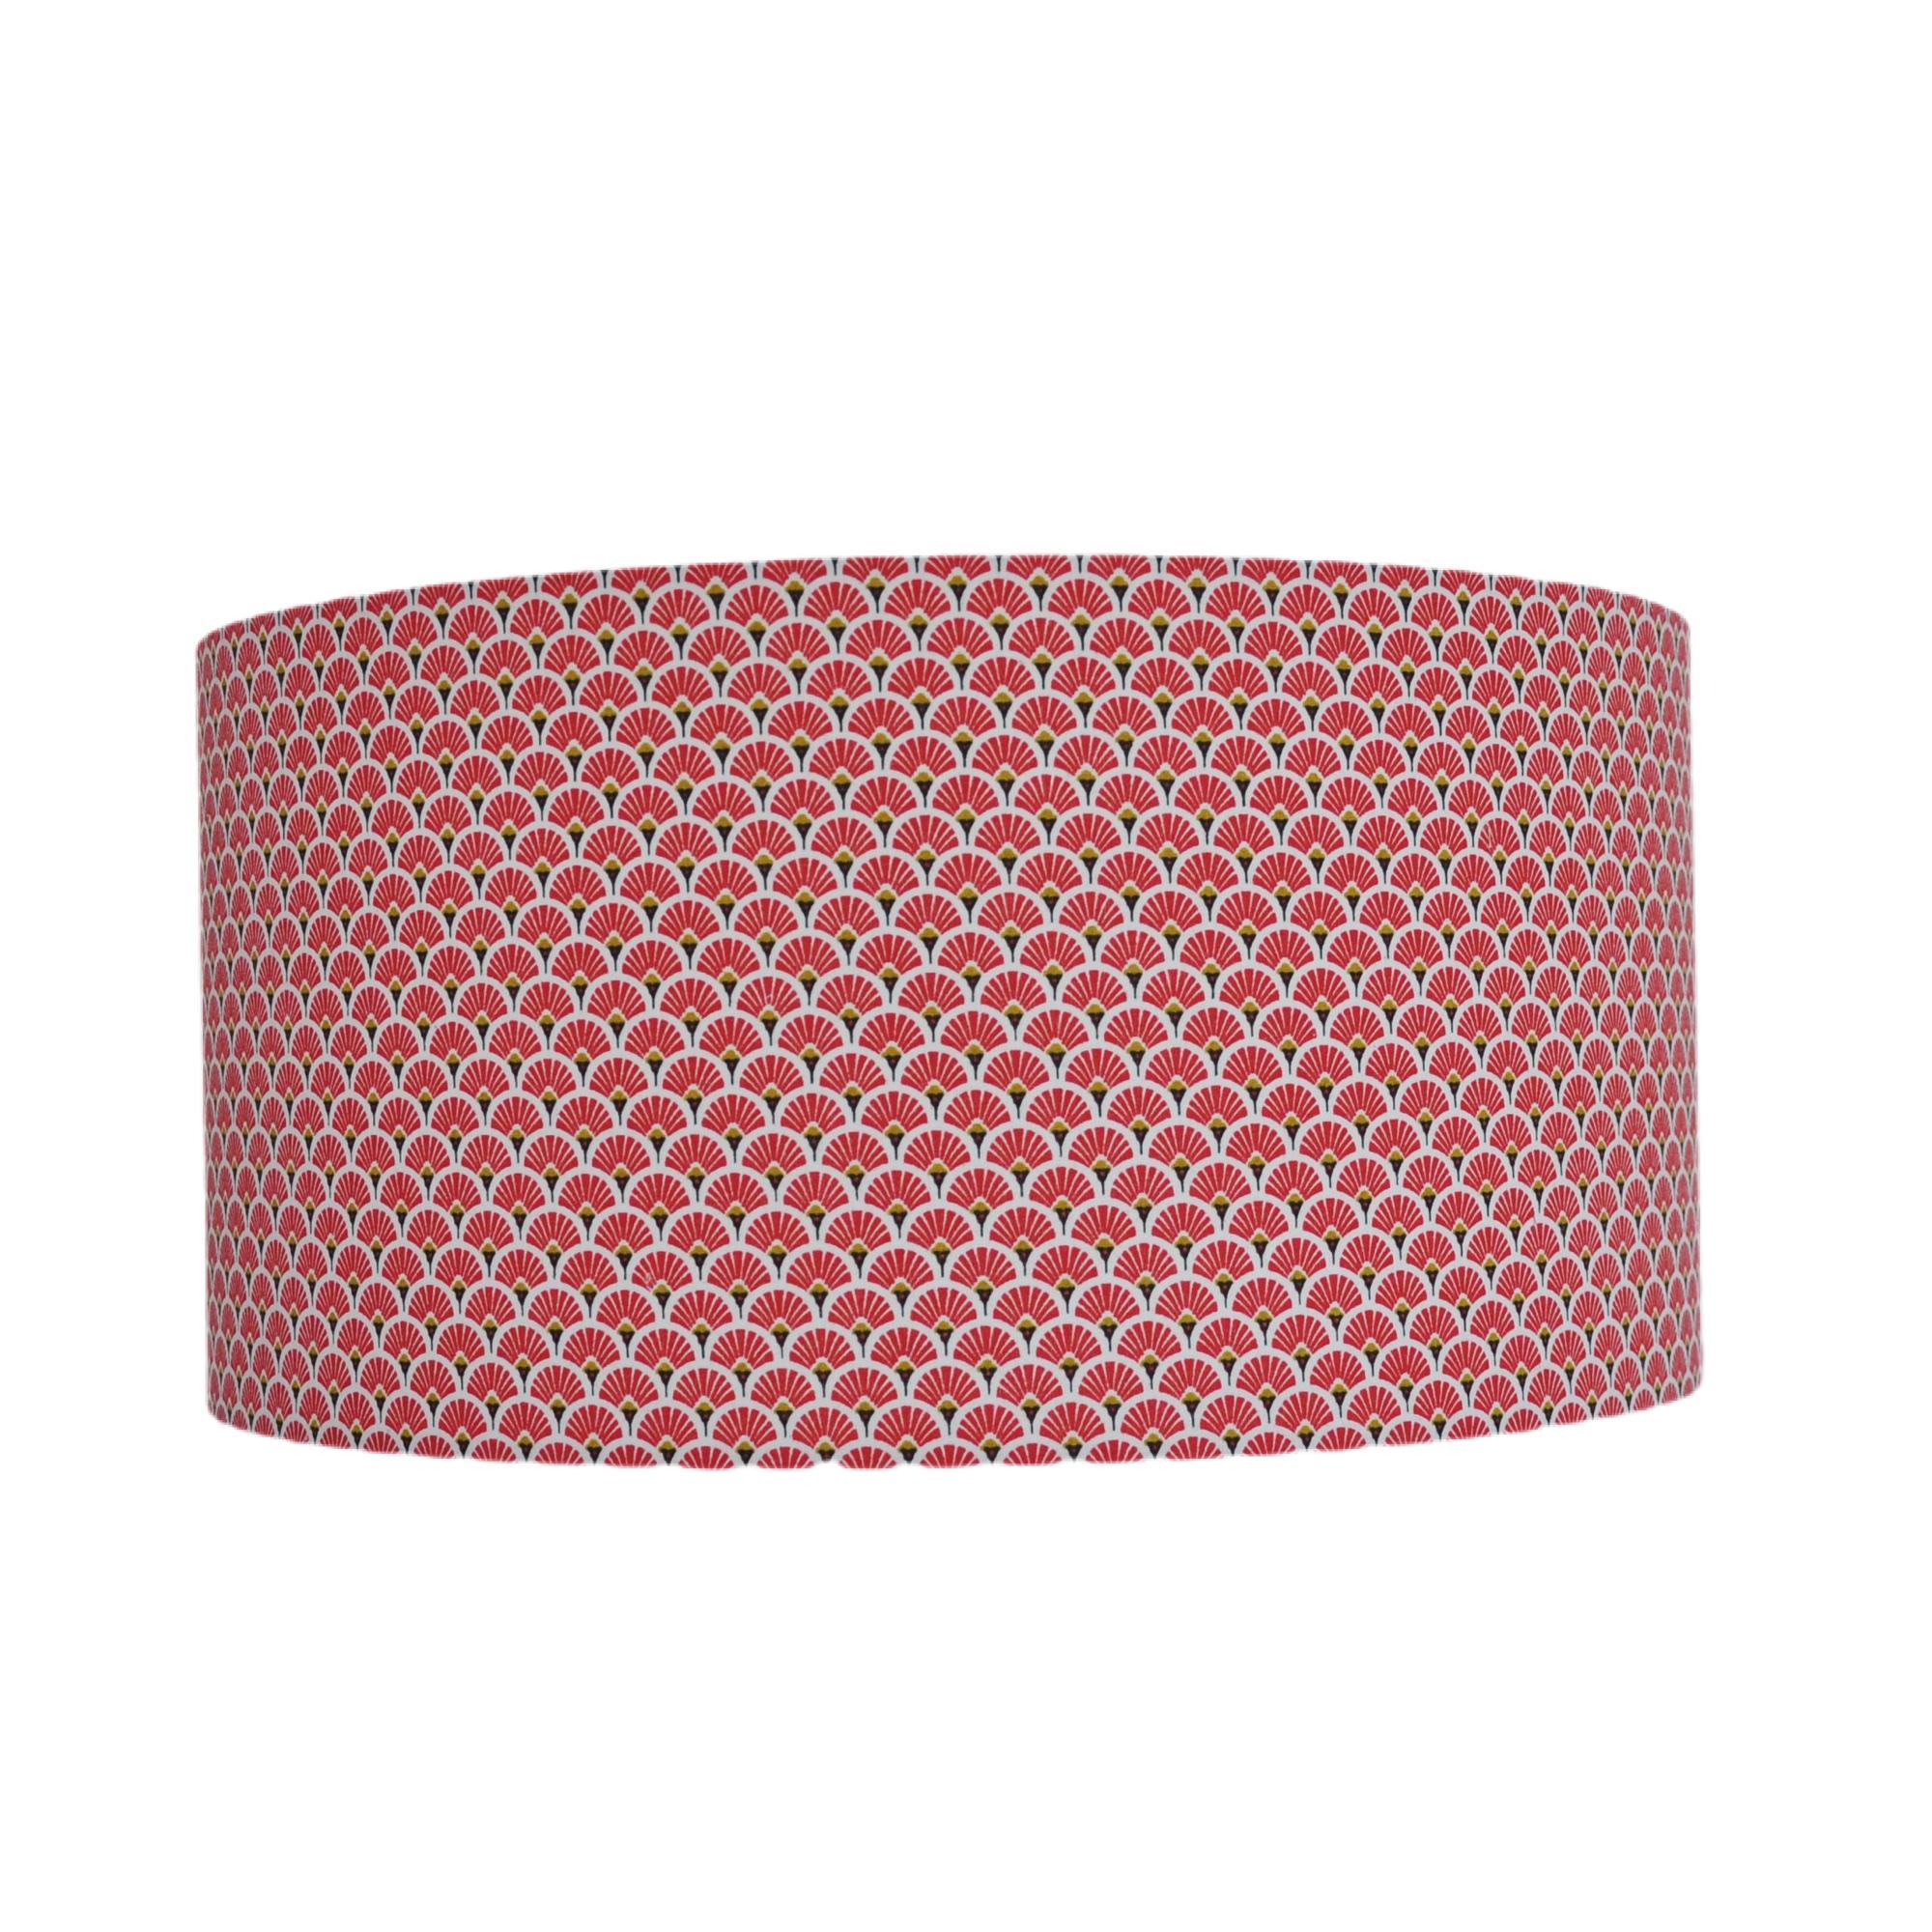 Suspension eventail rouge et or diamètre 30 cm